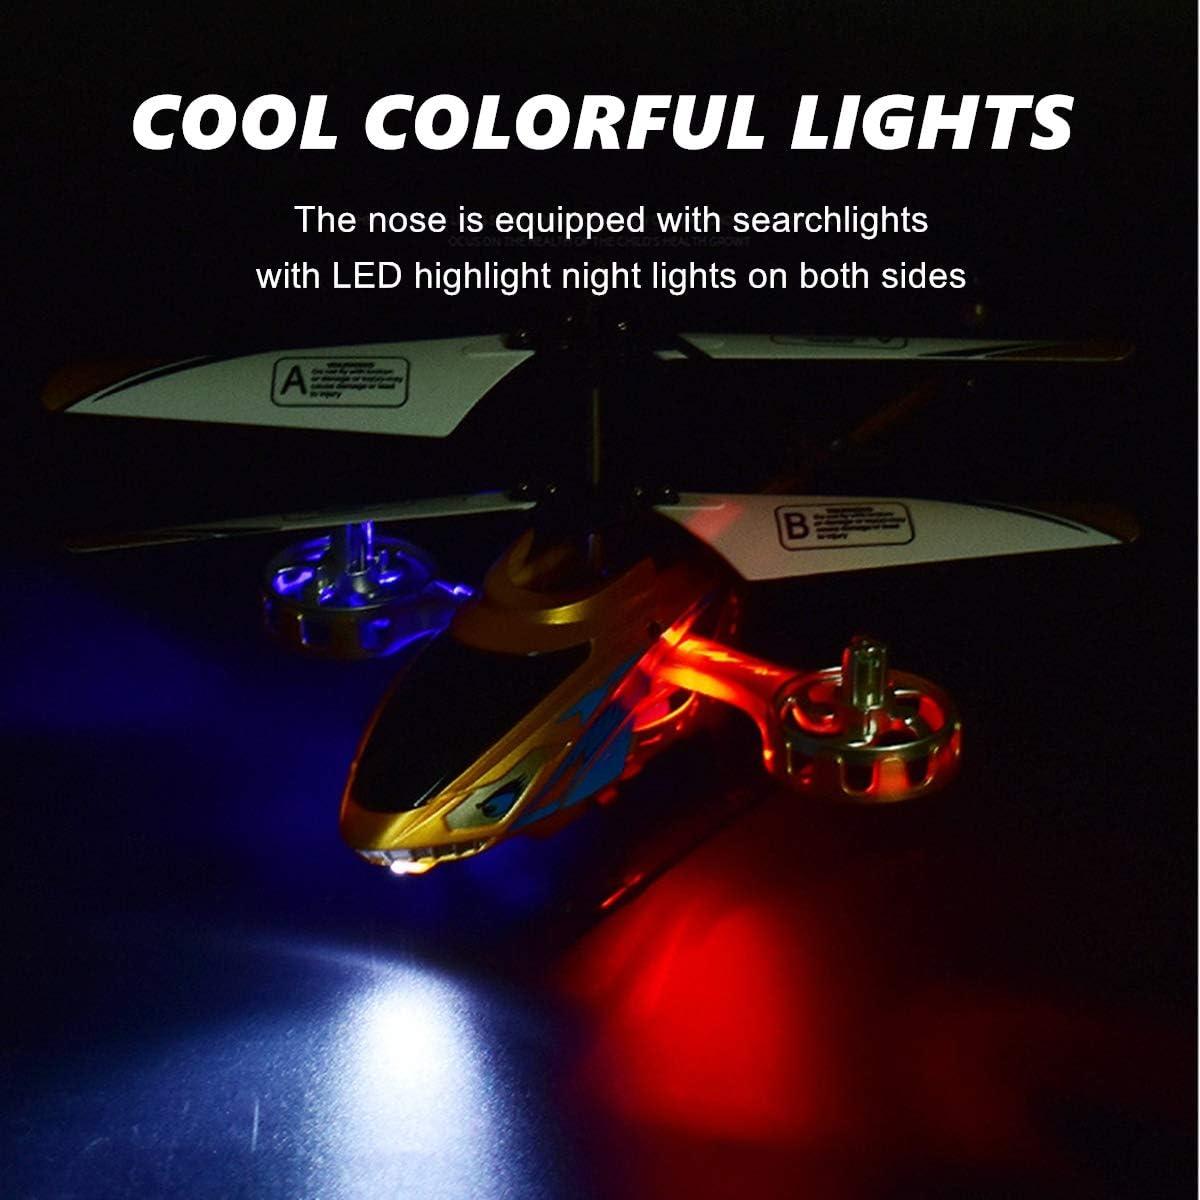 2,4 GHz Regalo para Ni/ños XIAOKEKE Helic/óptero Teledirigido Teledirigido con Mando A Distancia para Interior Y Exterior 3,5 Canales Luz LED Girosc/ópica,Oro